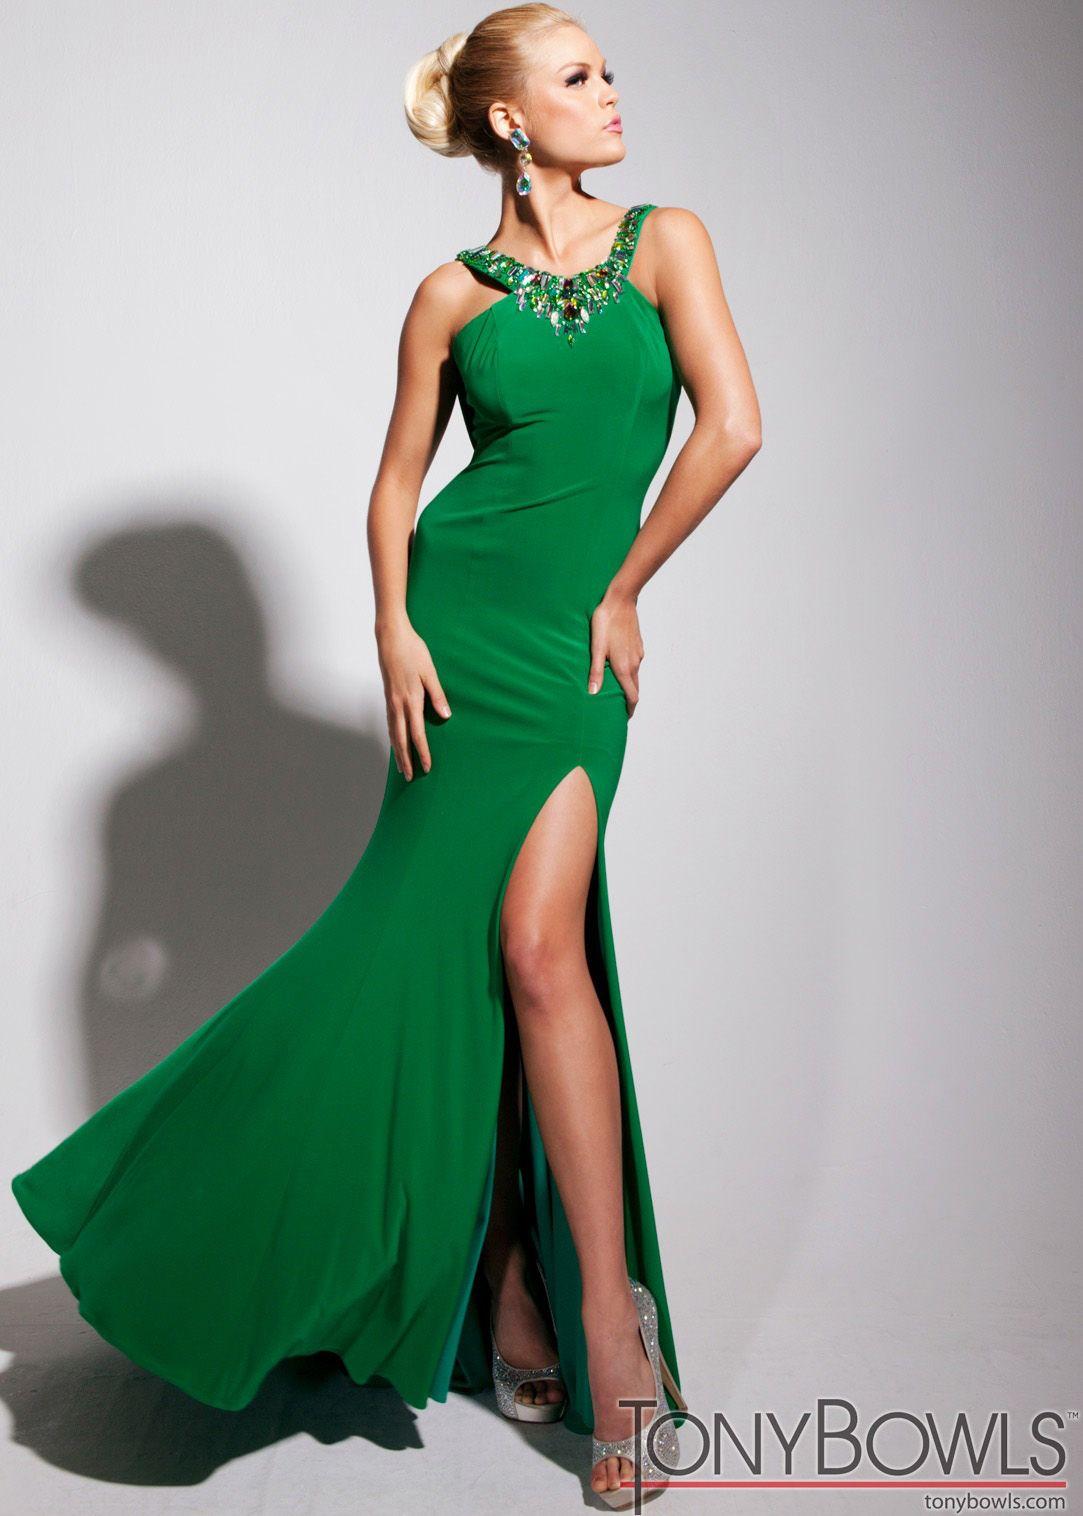 Tony bowls tbe emerald jeweled sleeveless prom dresses online